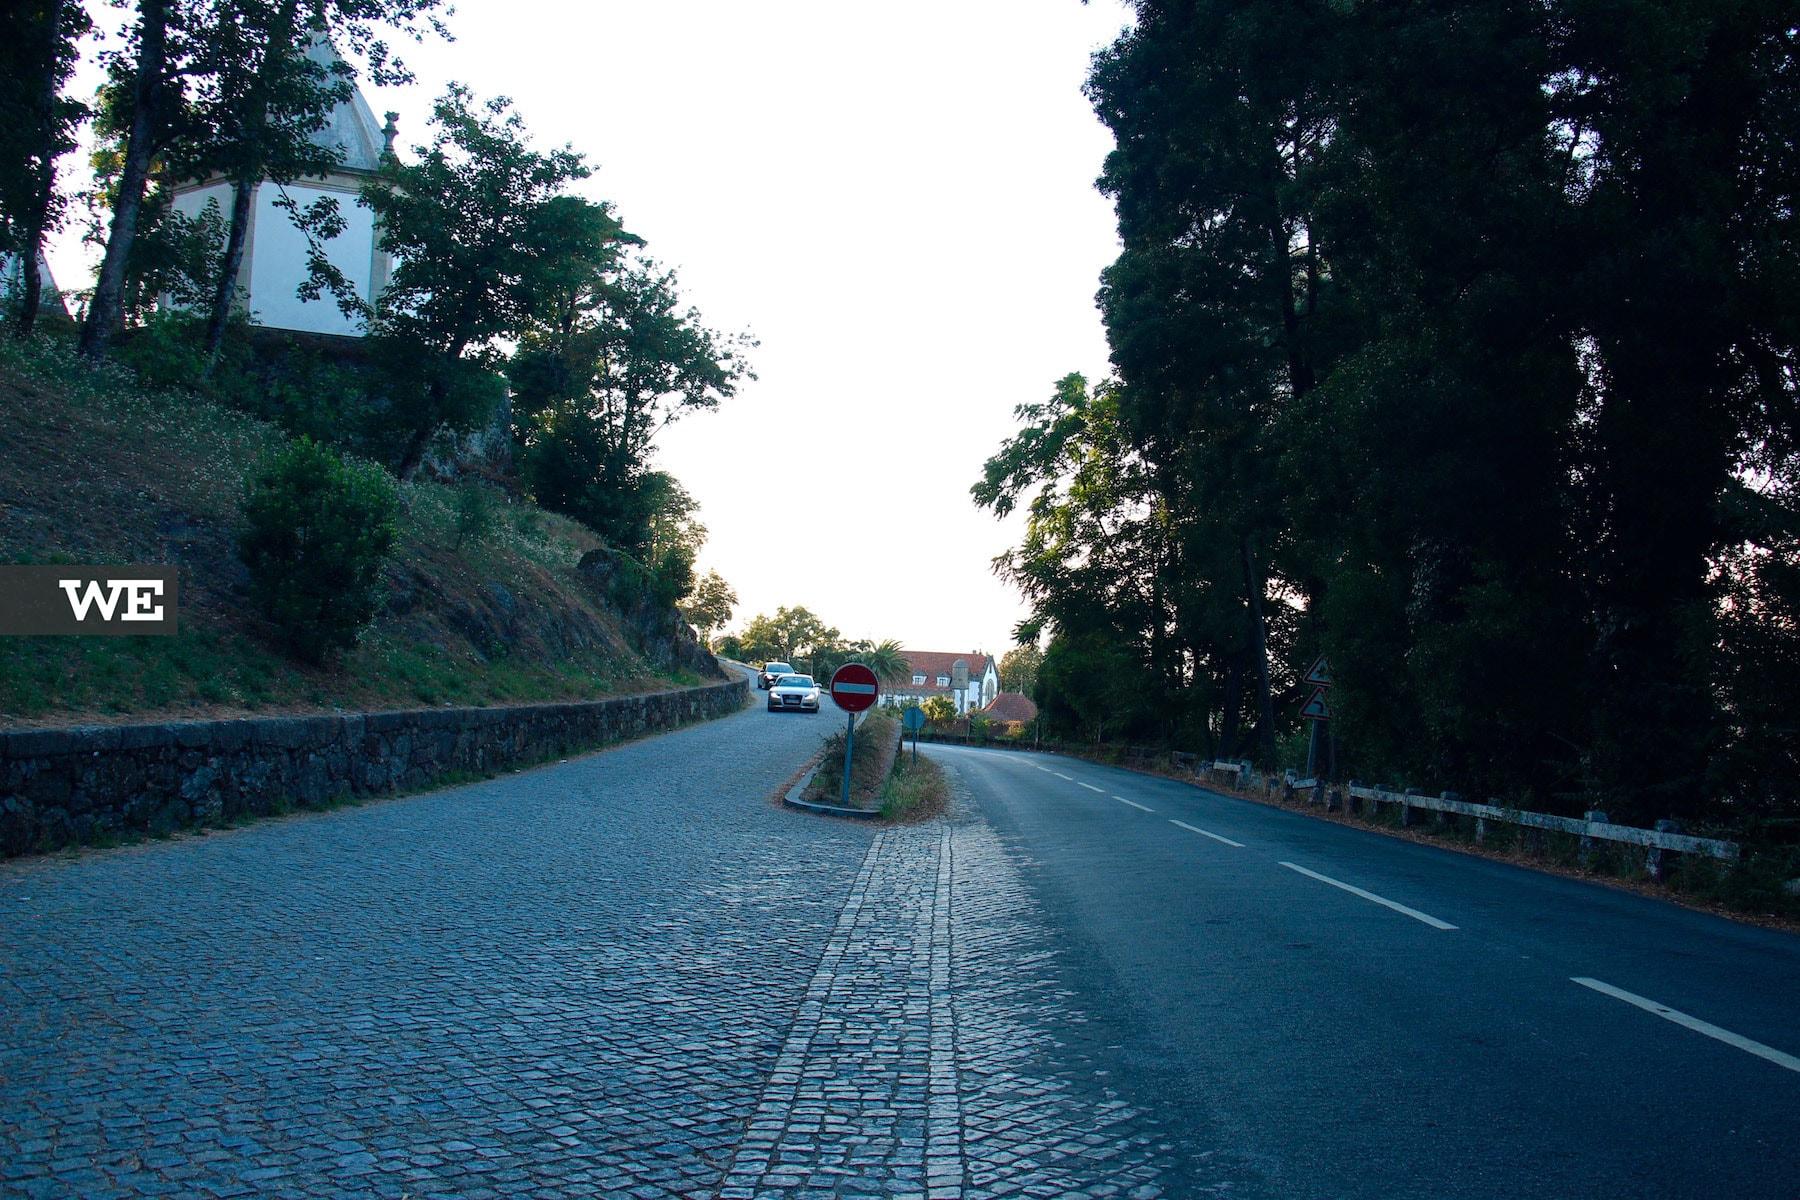 Estrada Mágica Bom Jesus de Braga